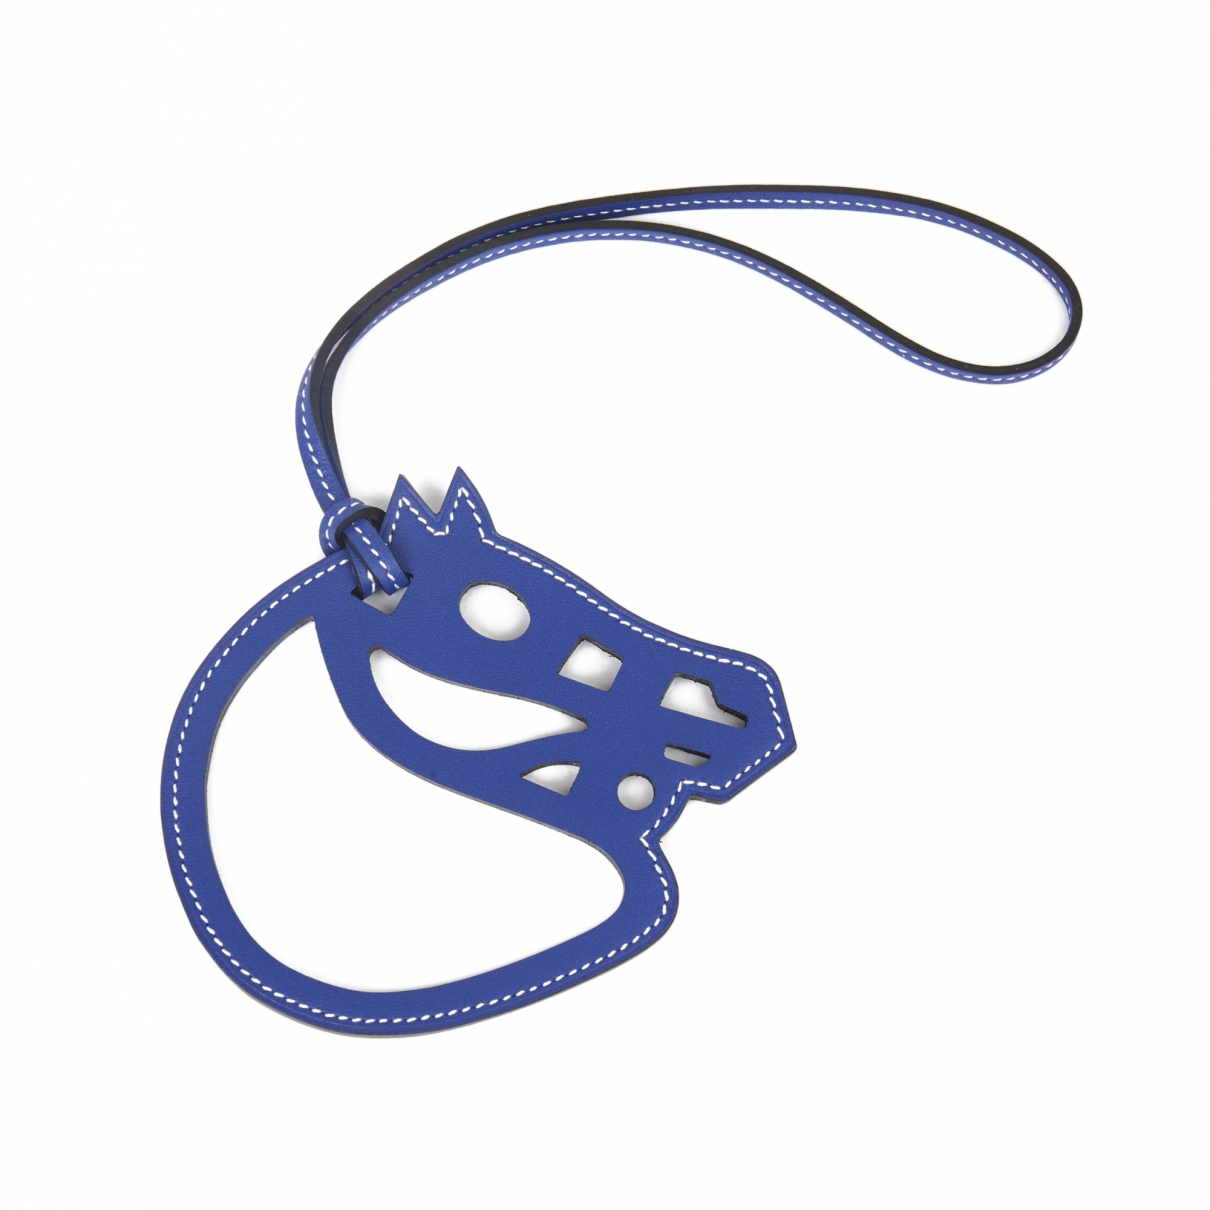 Hermes Paddock Taschenschmuck in  Blau Leder